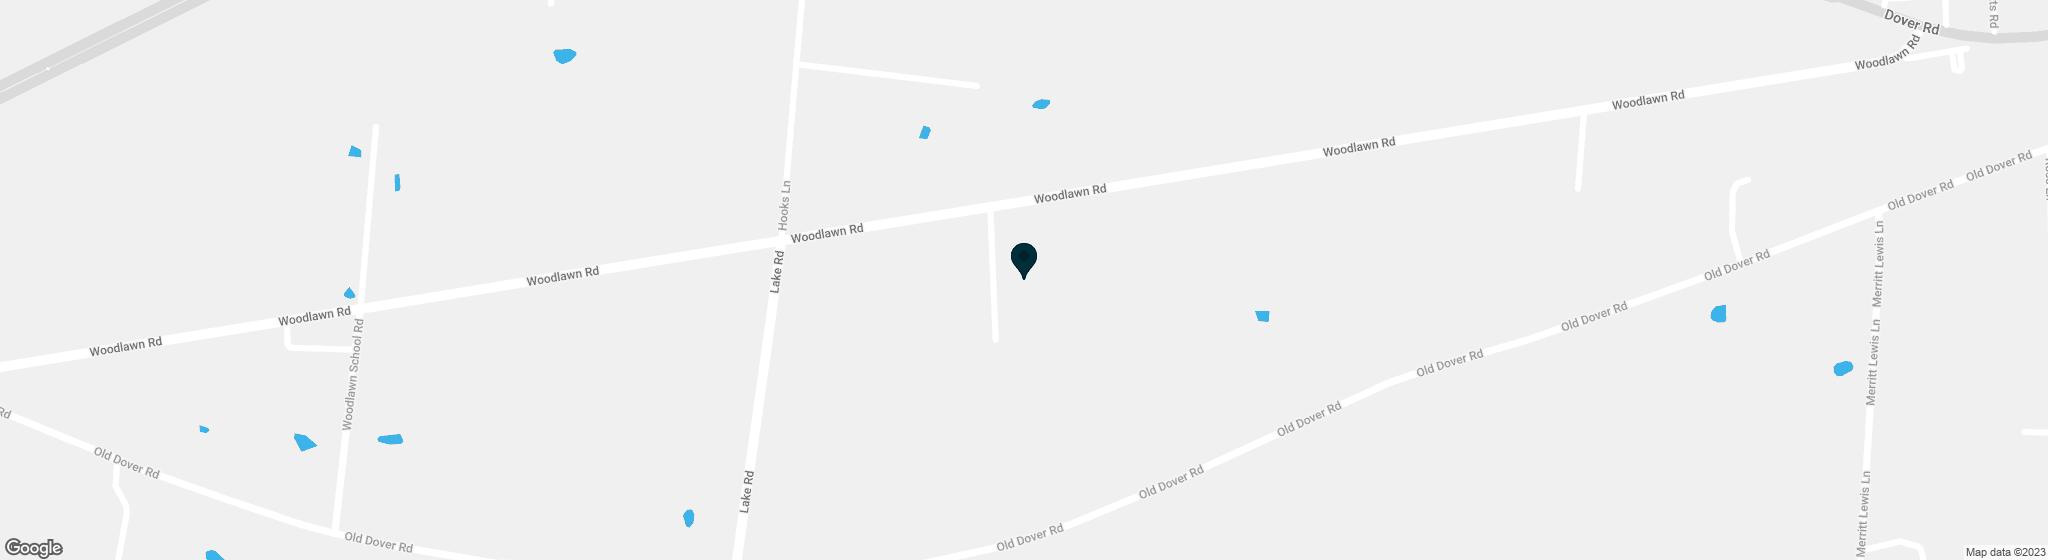 1912 Woodlawn Rd Clarksville TN 37042